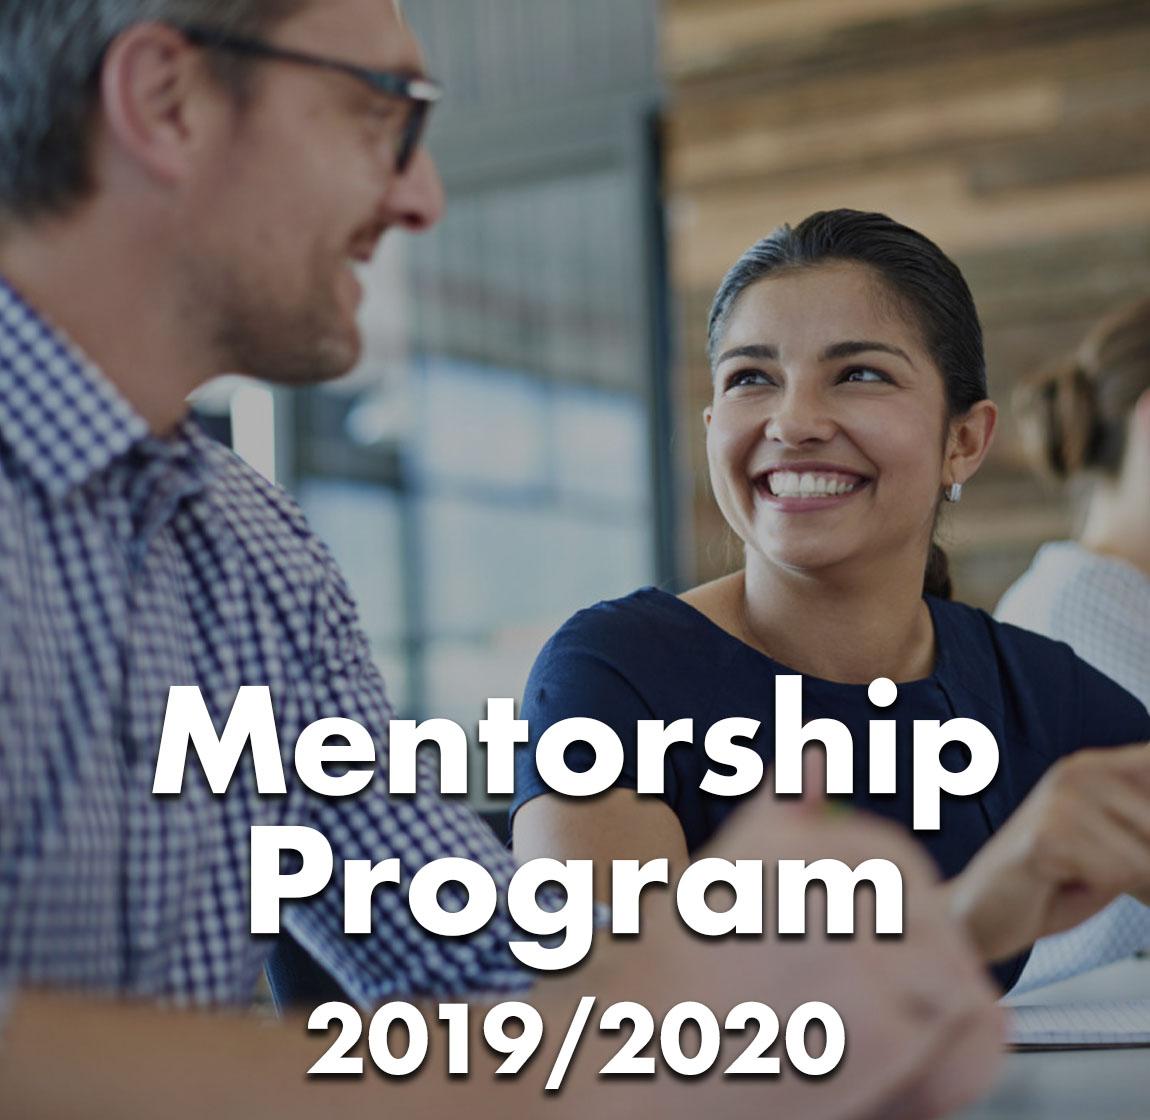 Mentorship Program 2019/2020